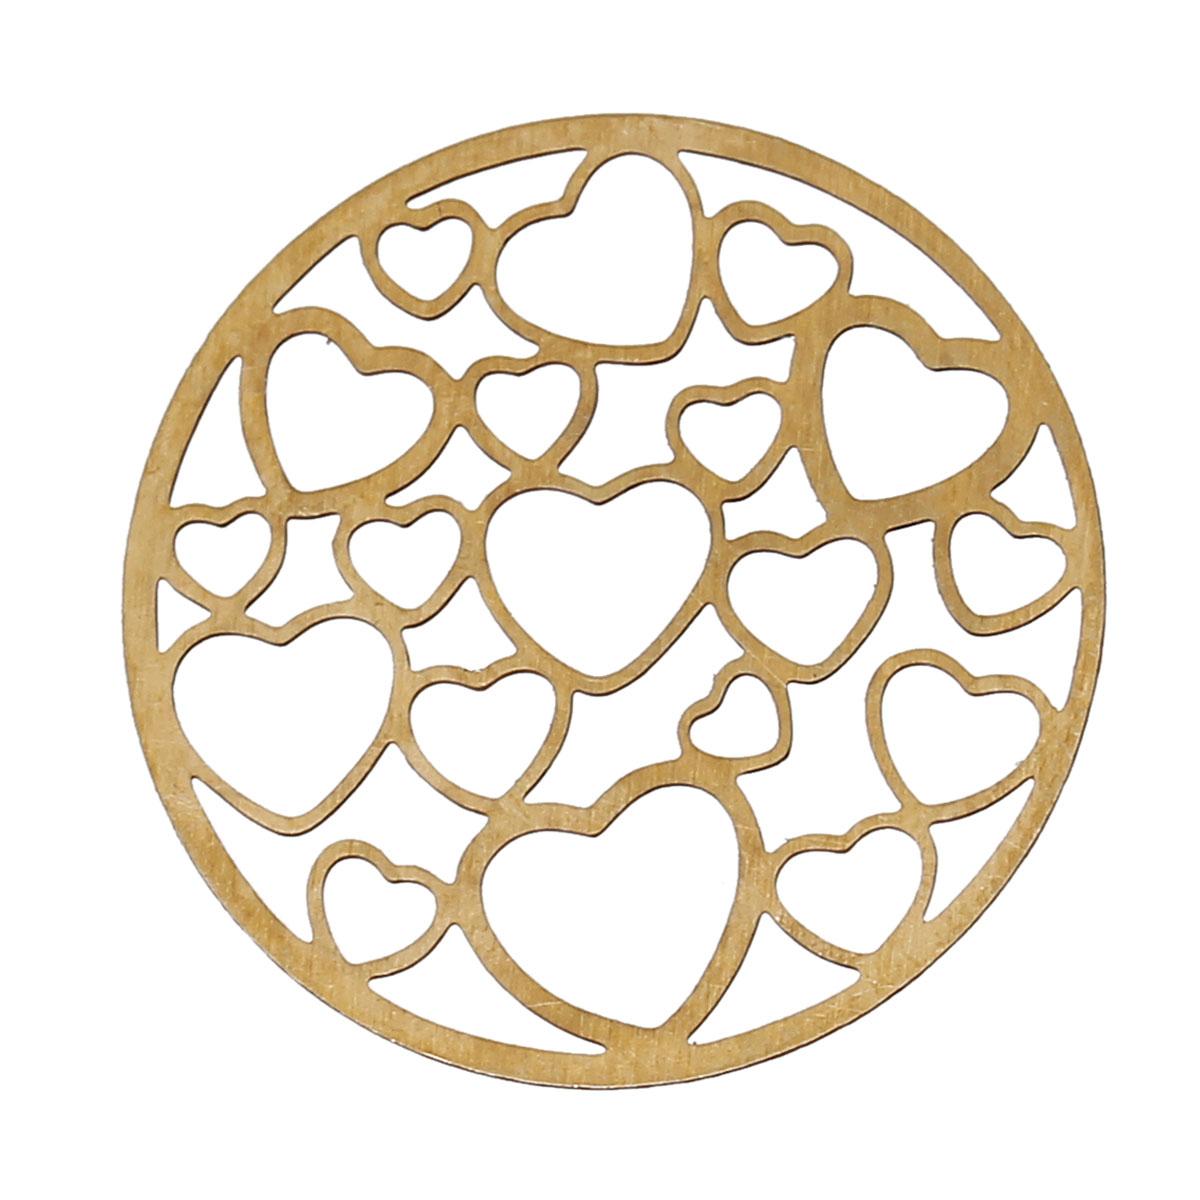 DoreenBeads Copper Embellishments Findings Round Brass Tone Hollow Heart Pattern Blank 22mm(7/8)Dia,50 PCs 2015 new